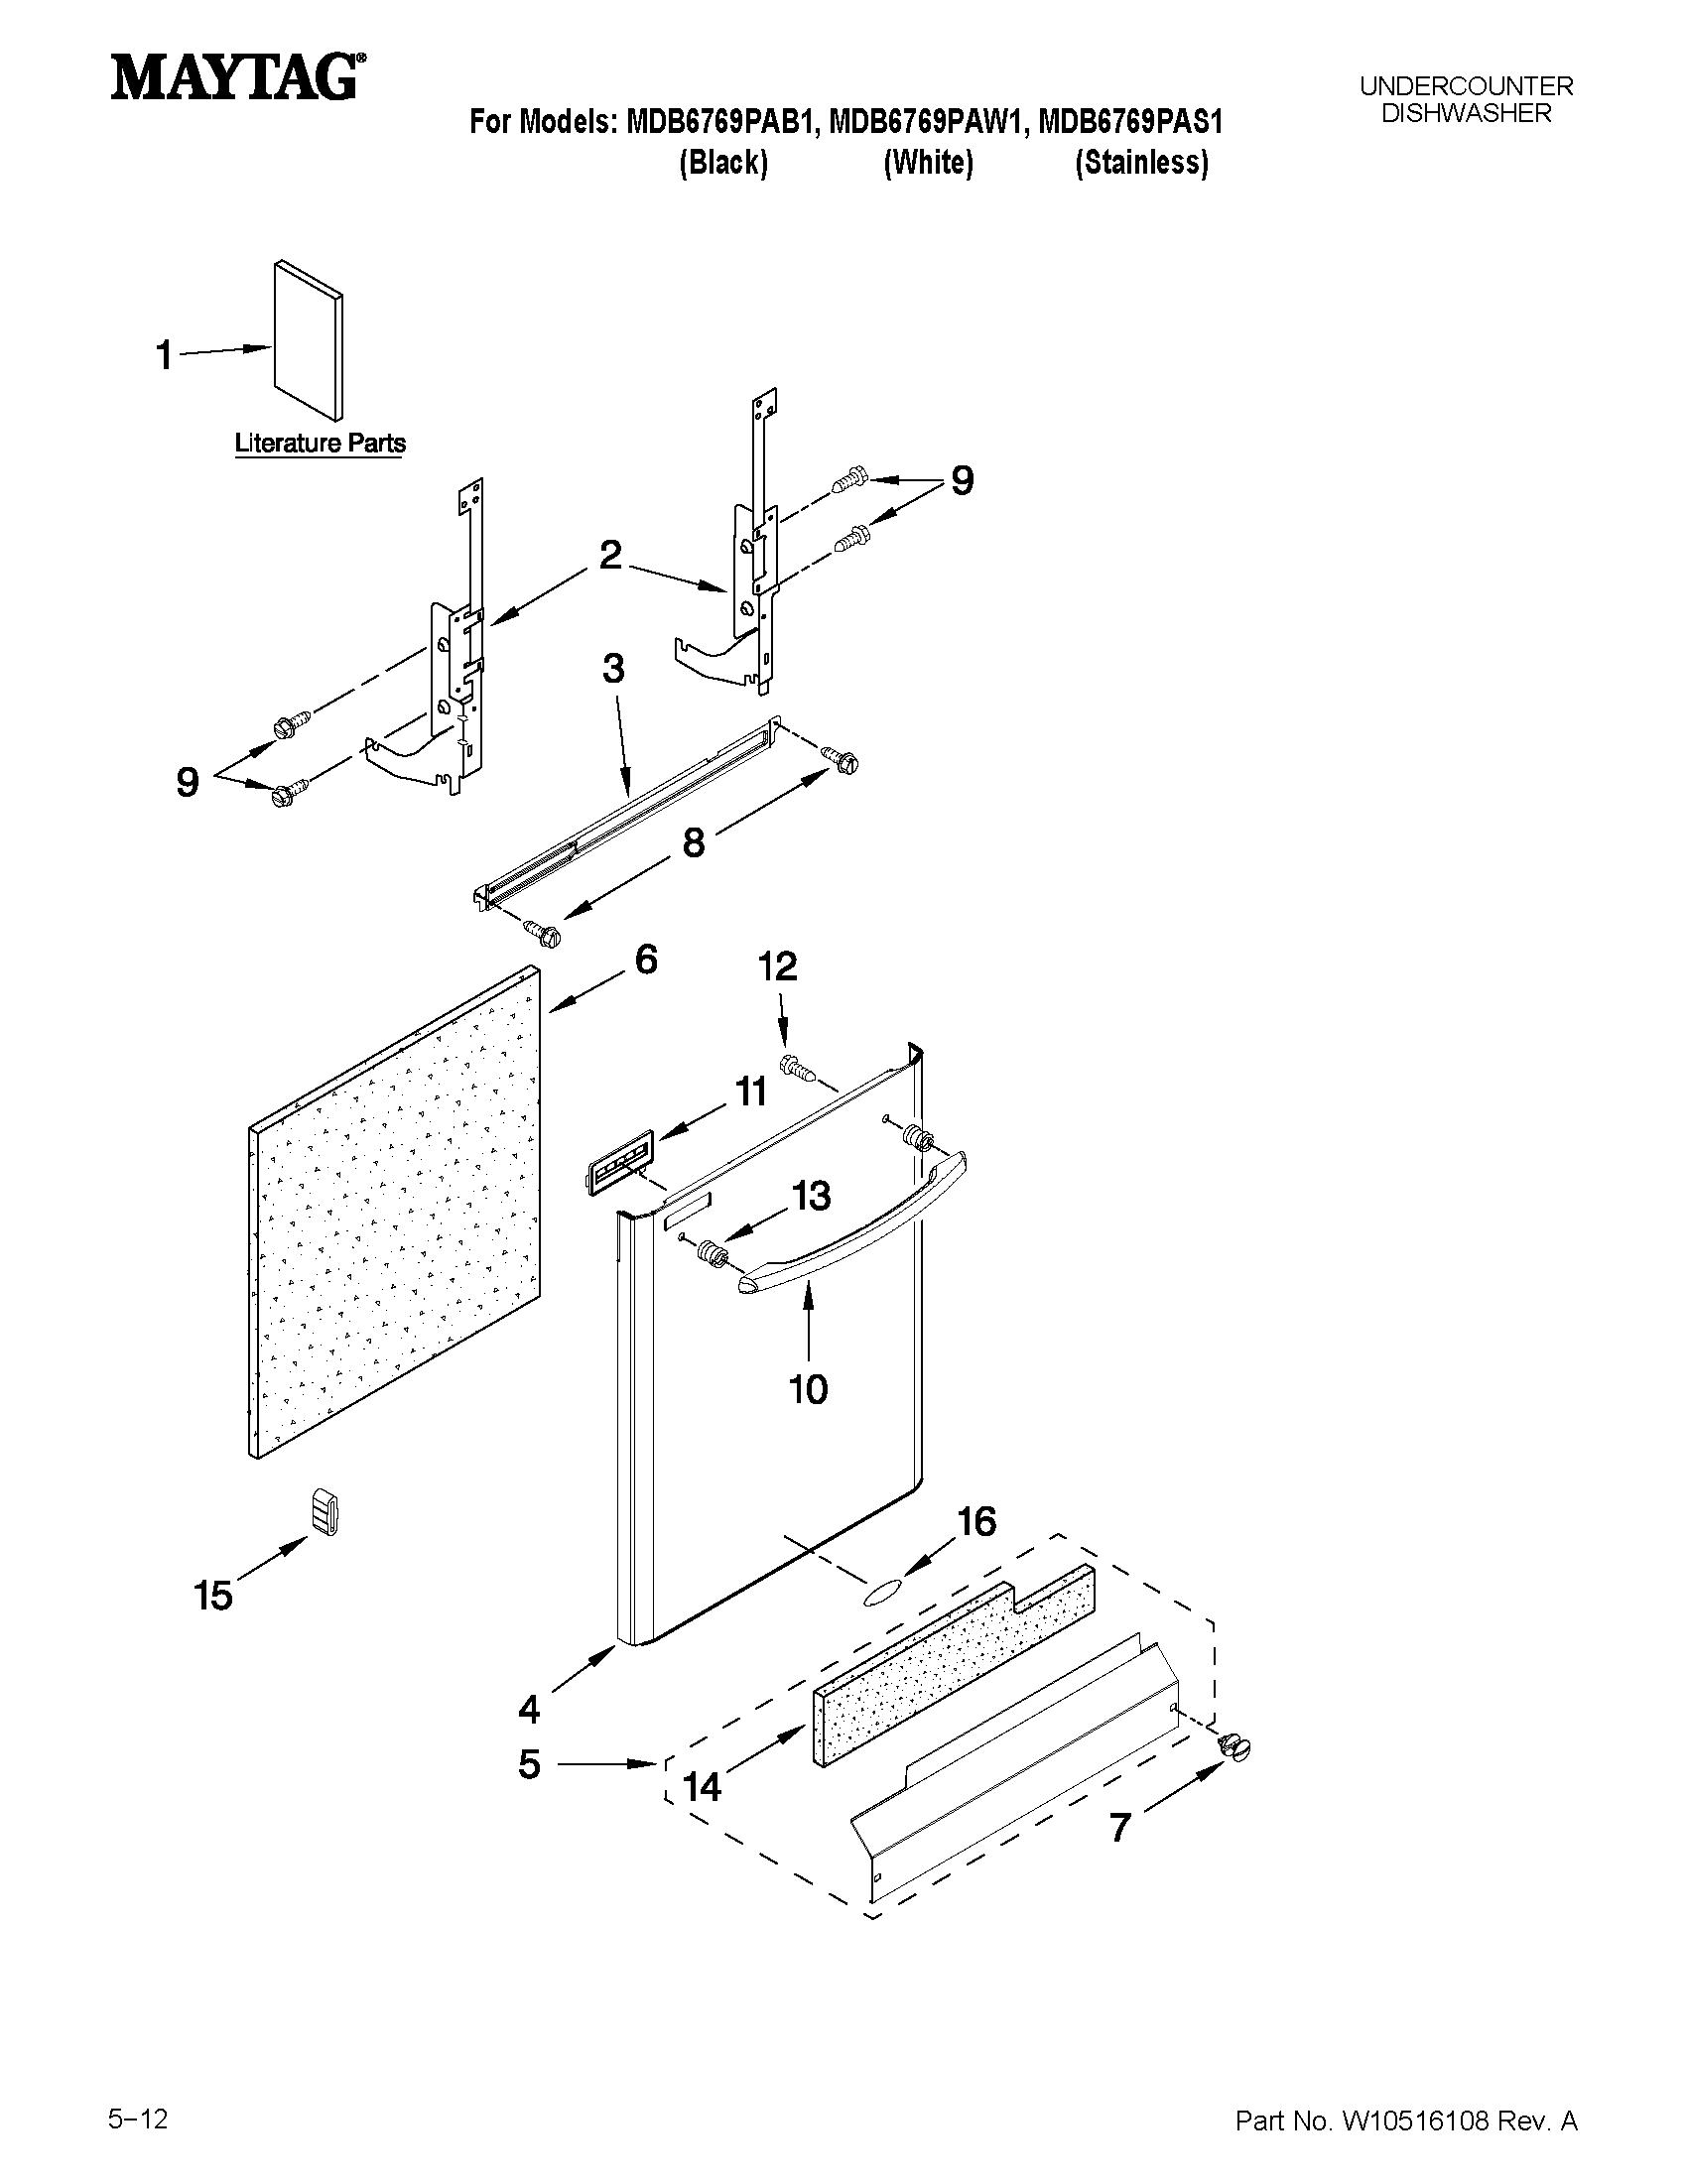 Maytag model MDB6769PAS1 dishwasher genuine parts